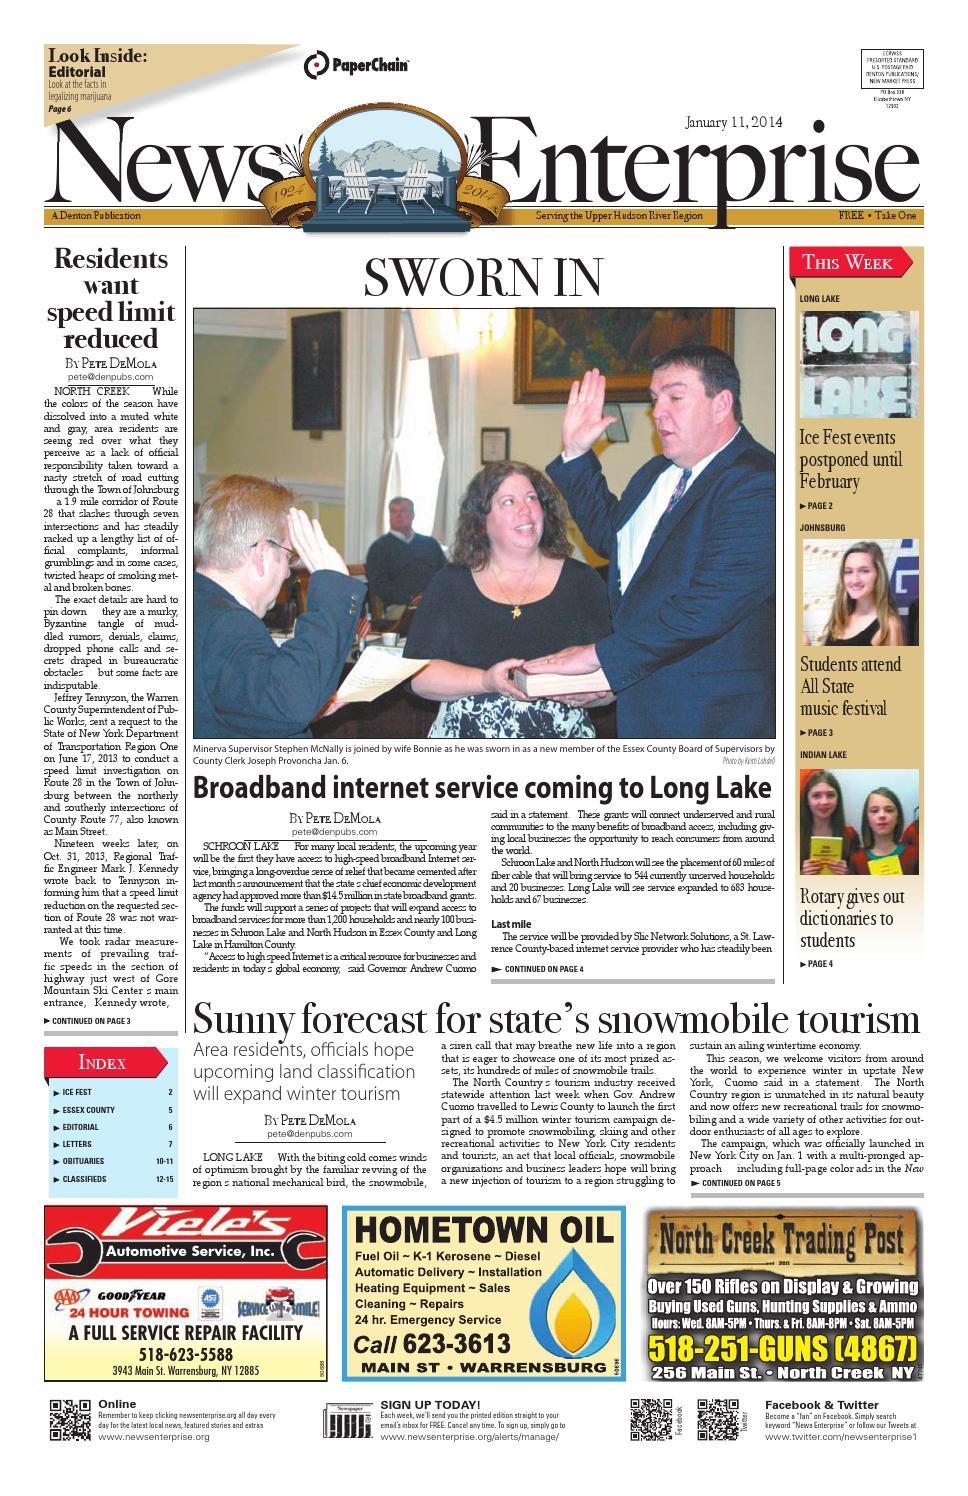 20140111 newsenterprise by Sun Community News and Printing